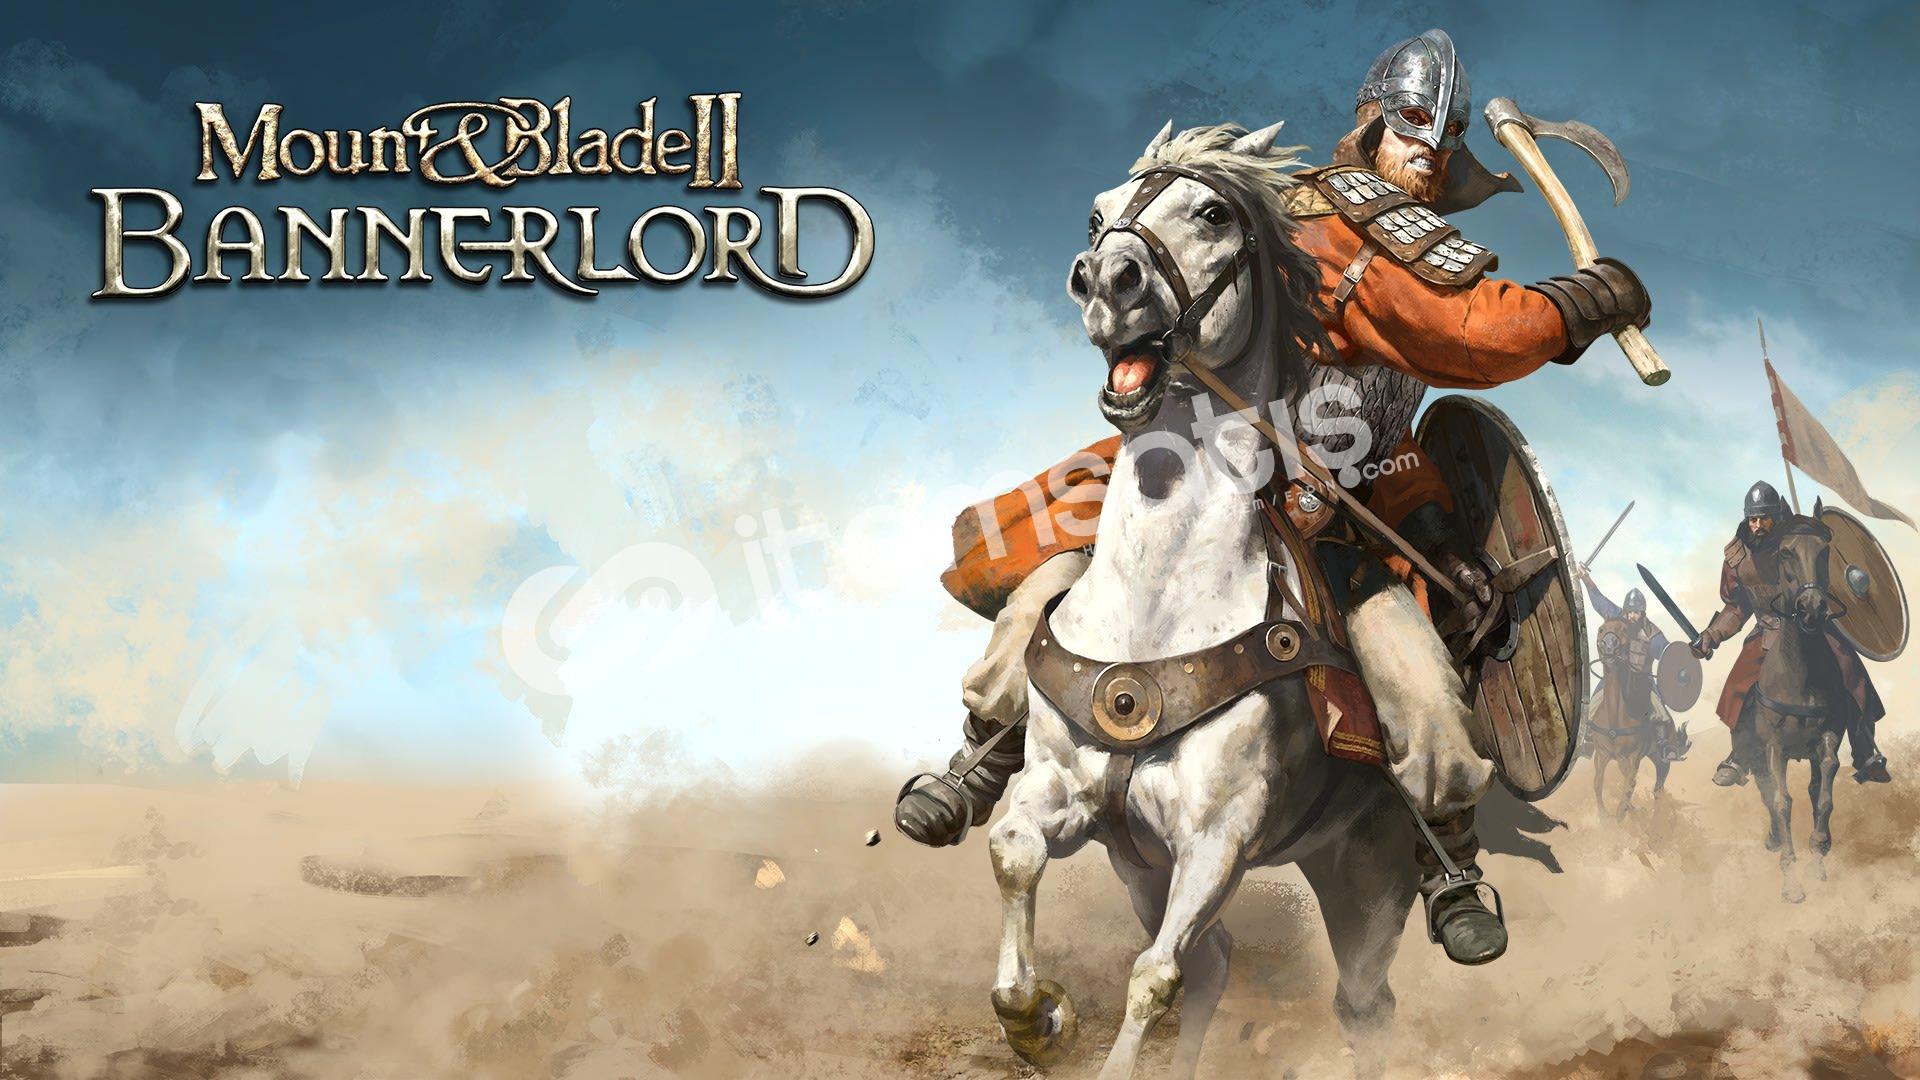 Mount & Blade II: Bannerlord (3.00TL) GEFORCE NOW DESTEKLER